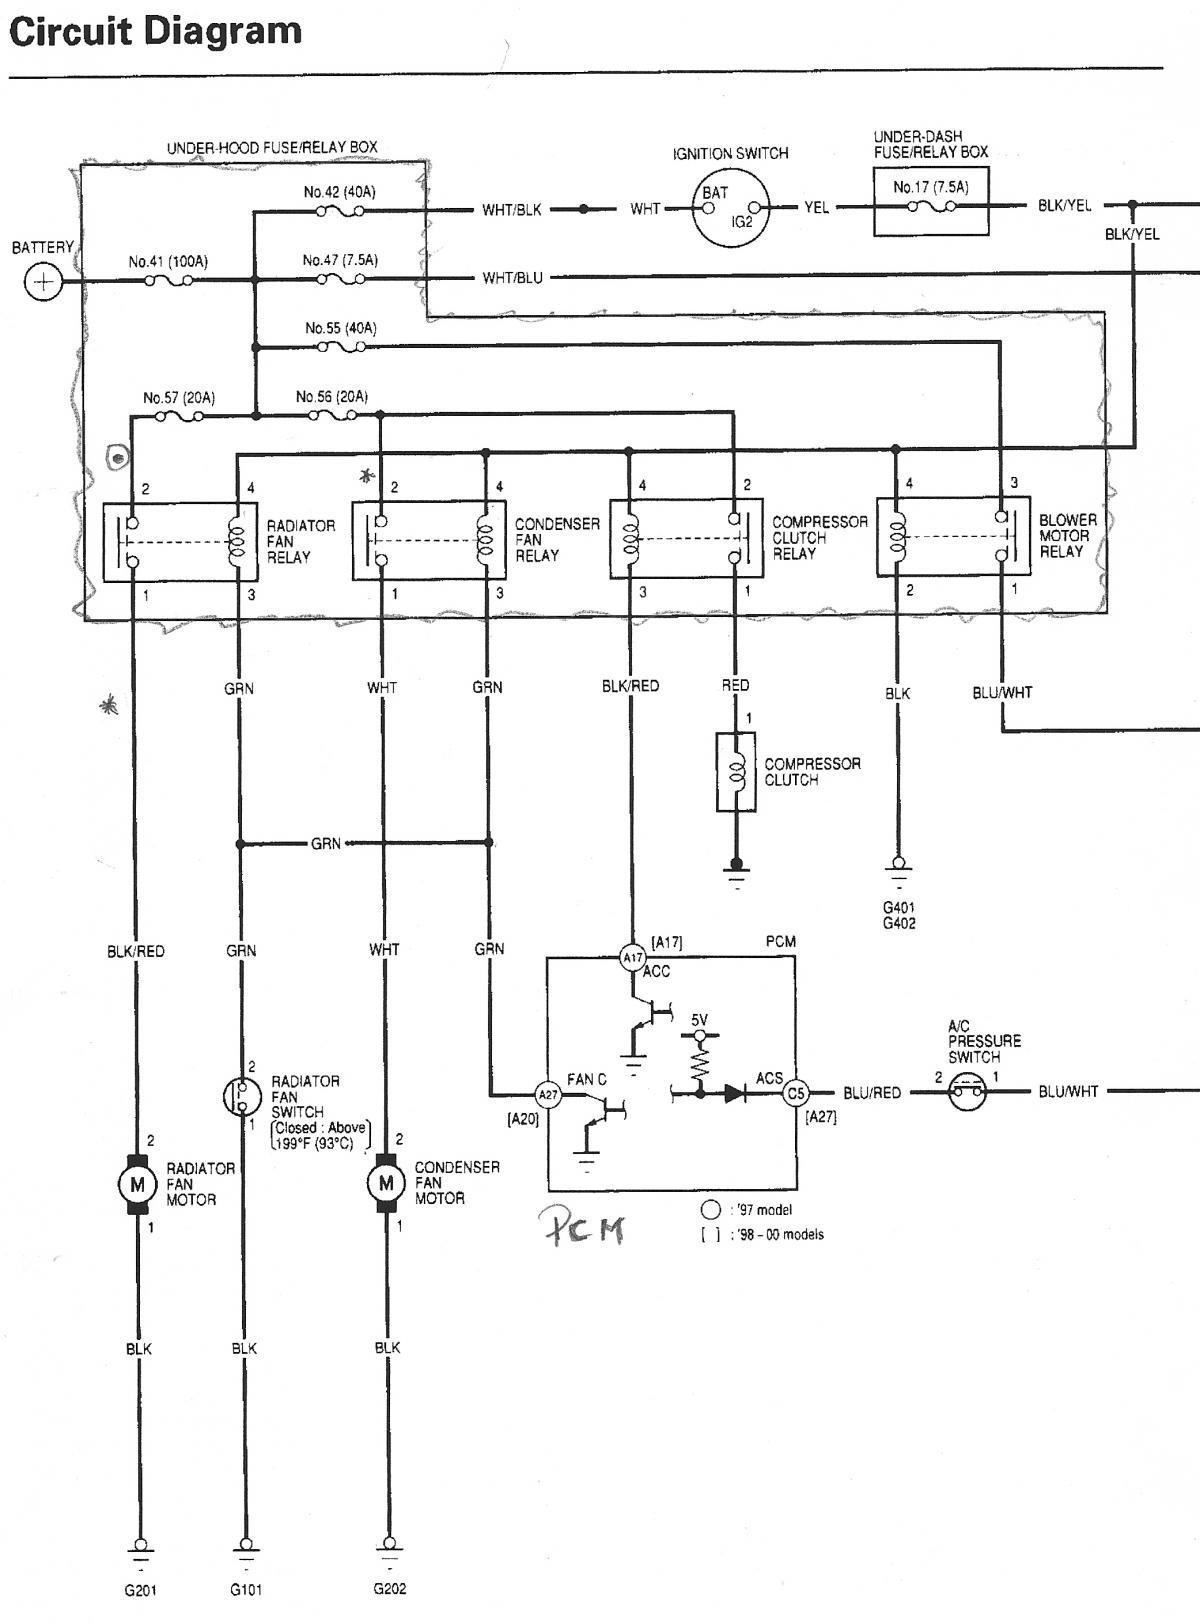 [DIAGRAM_5UK]  DIAGRAM] Honda Cr V 2001 Wiring Diagram FULL Version HD Quality Wiring  Diagram - LOLDATABASE.K-DANSE.FR | Honda 4518 Wiring Diagram |  | Database diagramming tool - K-danse.fr